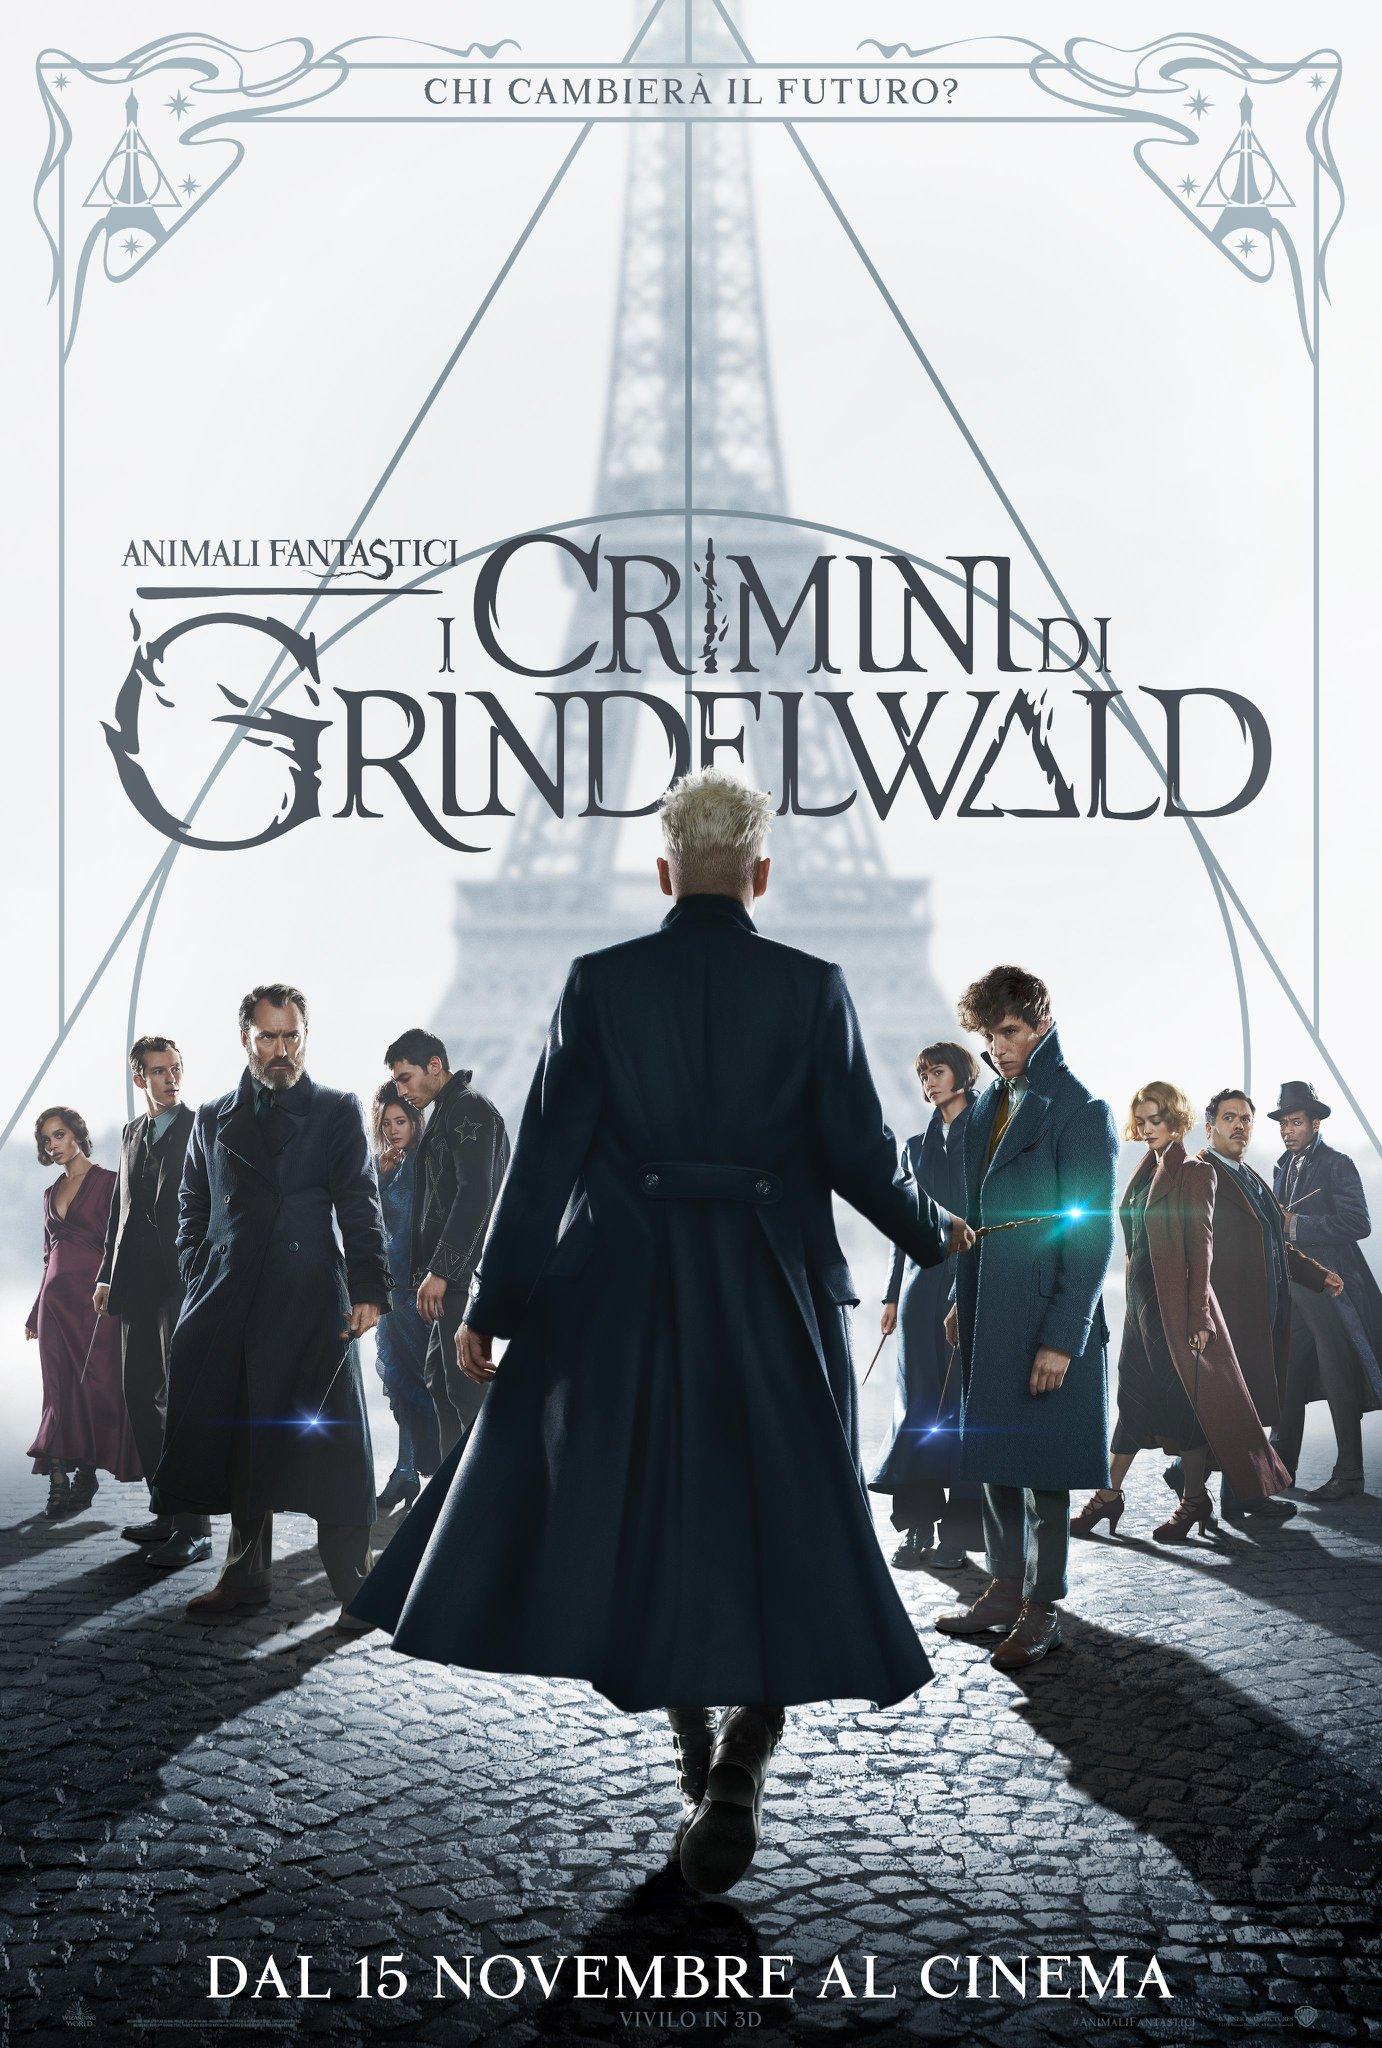 Animali Fantastici - I crimini di Grindelwald - David Yates